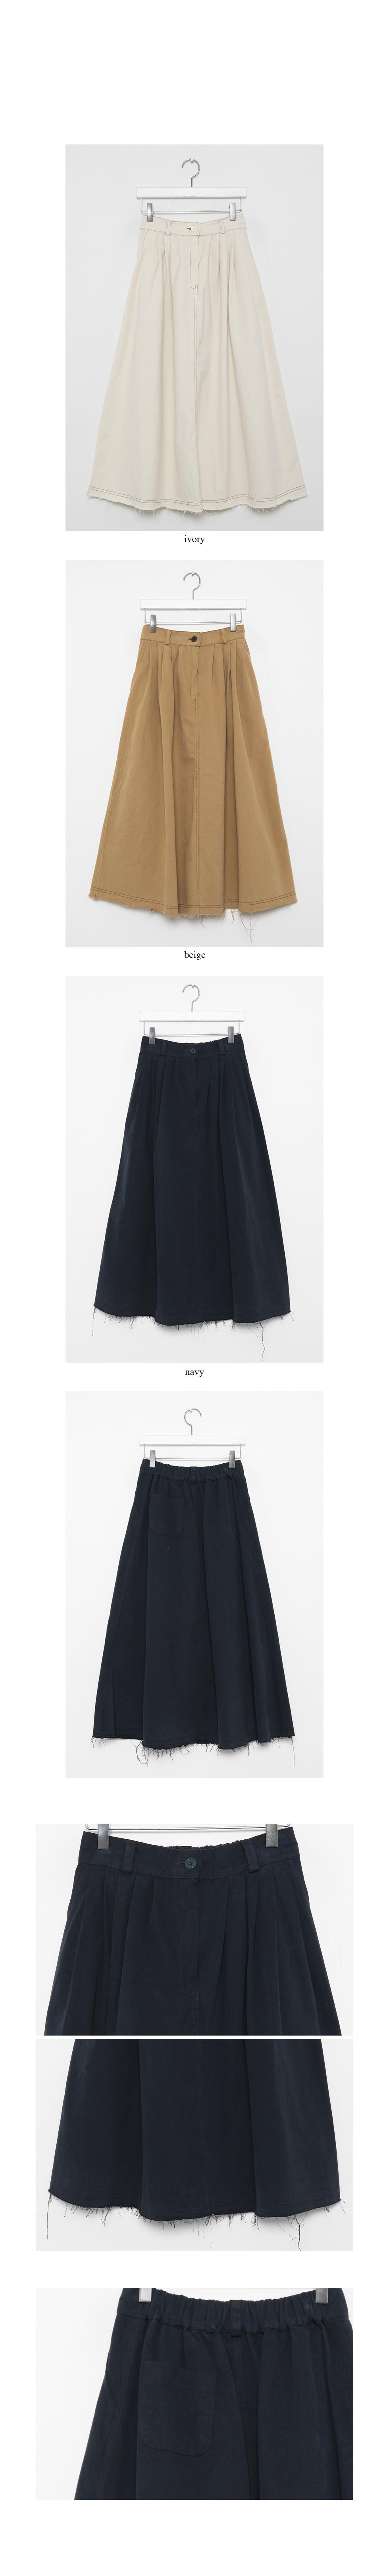 stitch tuck flair skirts